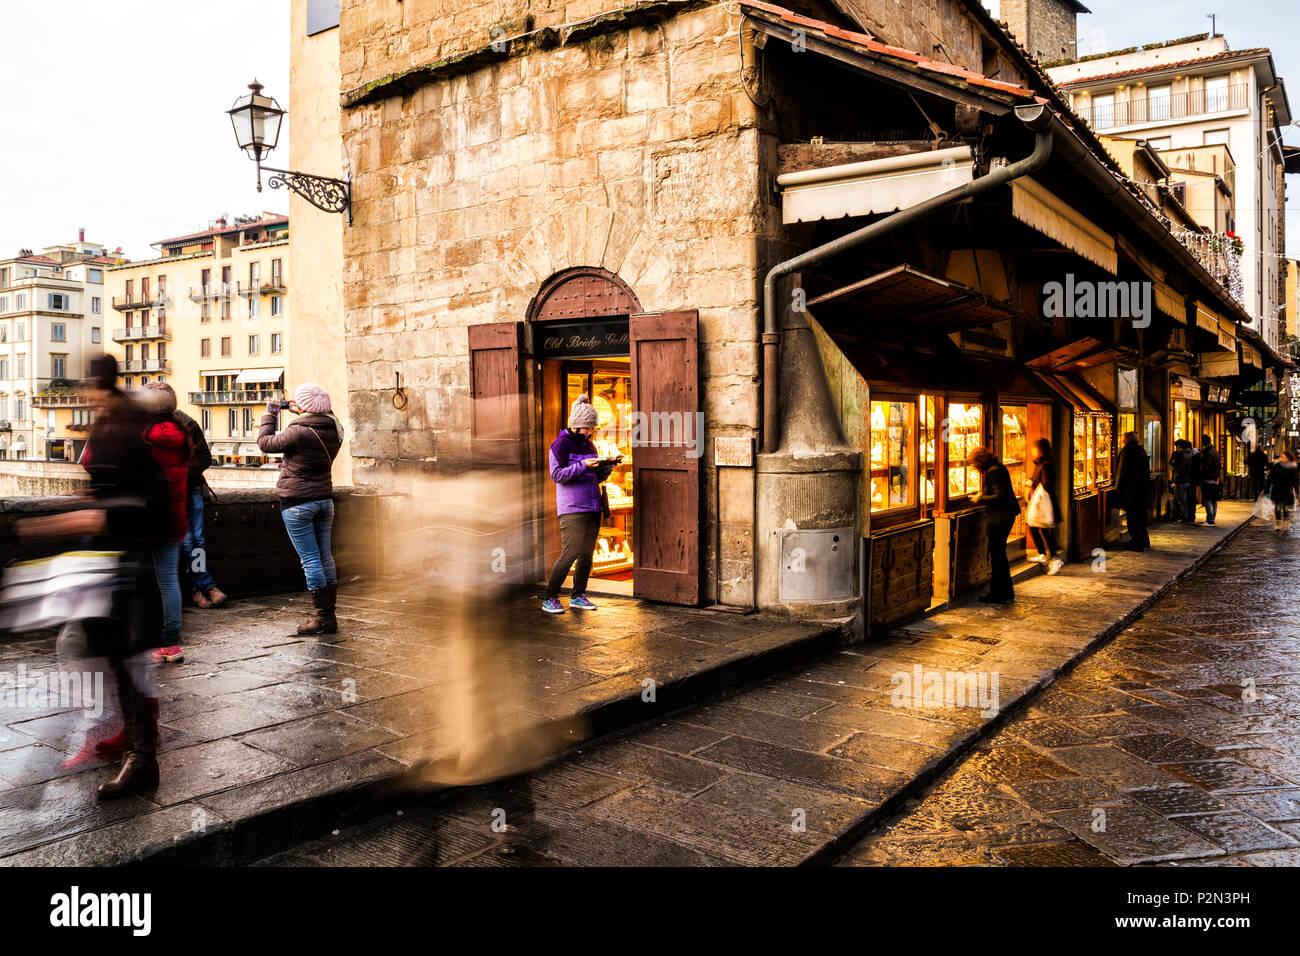 Shops on Ponte Vecchio (Old Bridge). Florence, Province of Florence, Italy. - Stock Image